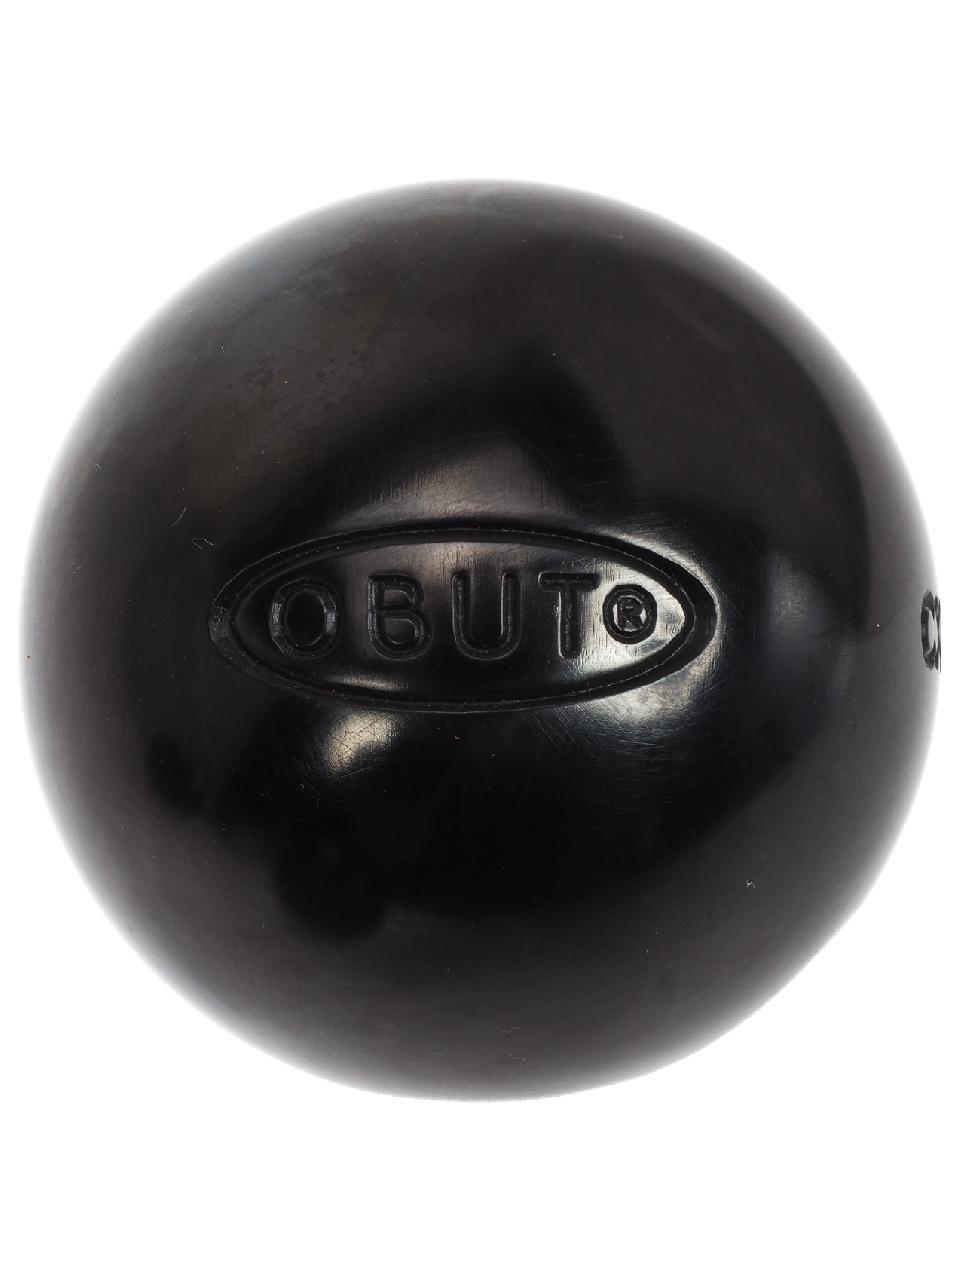 Hals schwarz 74/mm/-/Boccia-Kugeln Obut CX